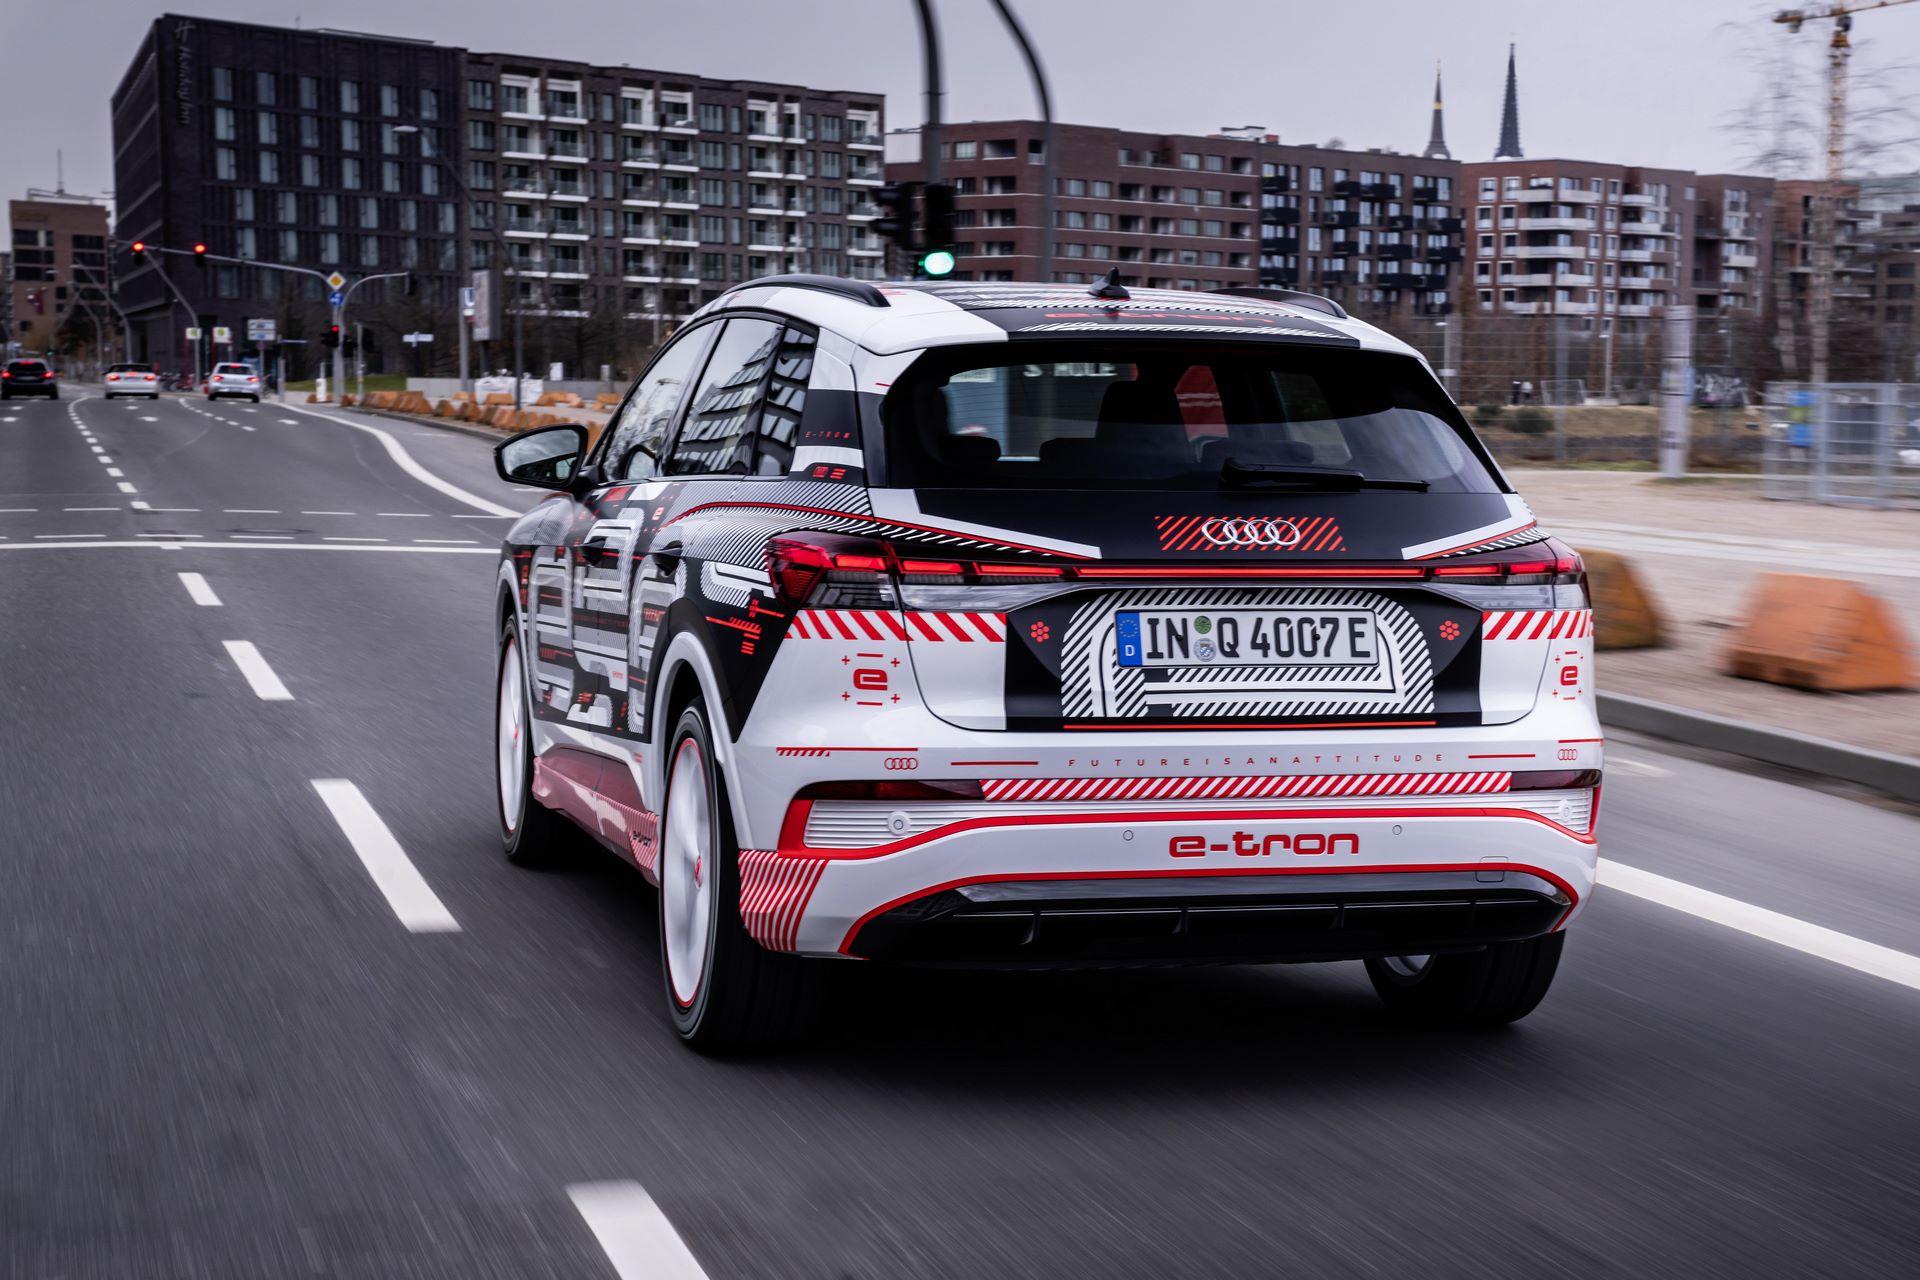 Audi-Q4-E-Tron-35